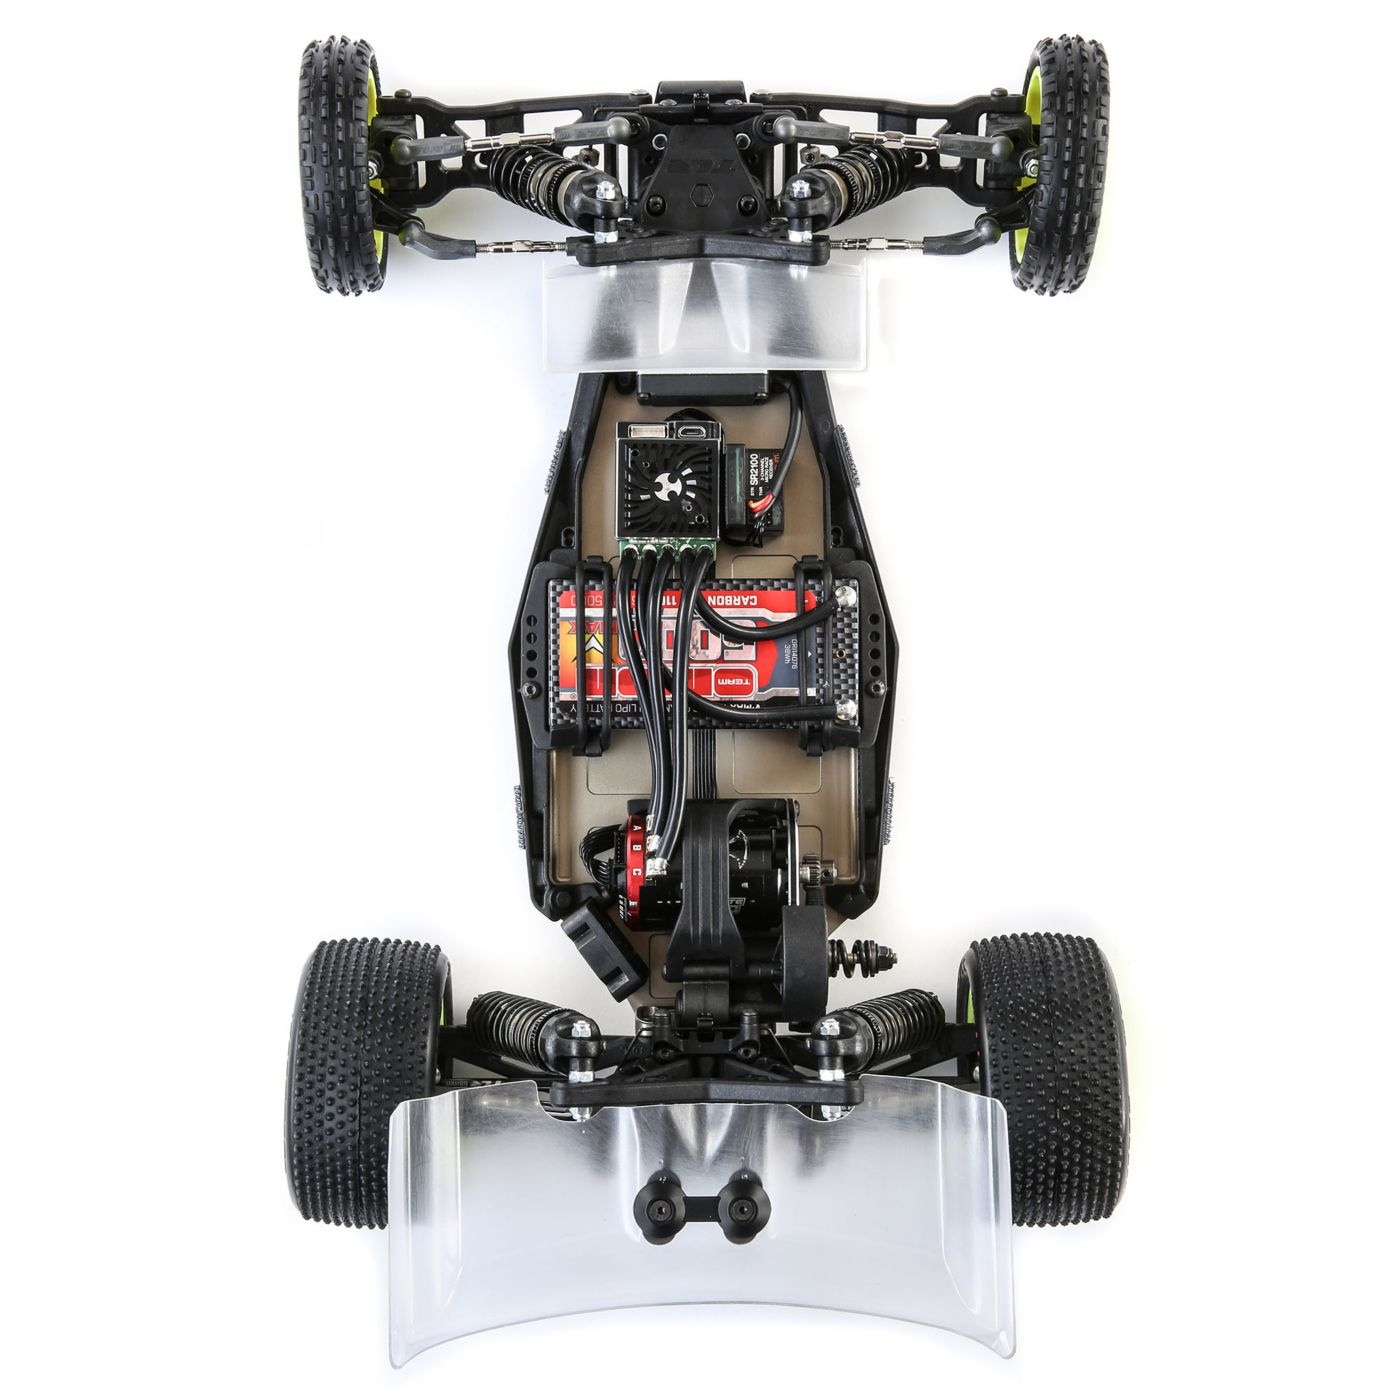 TLR 1/10 22 5 0 2WD Buggy AC Race Kit, Astro/Carpet (TLR03017)